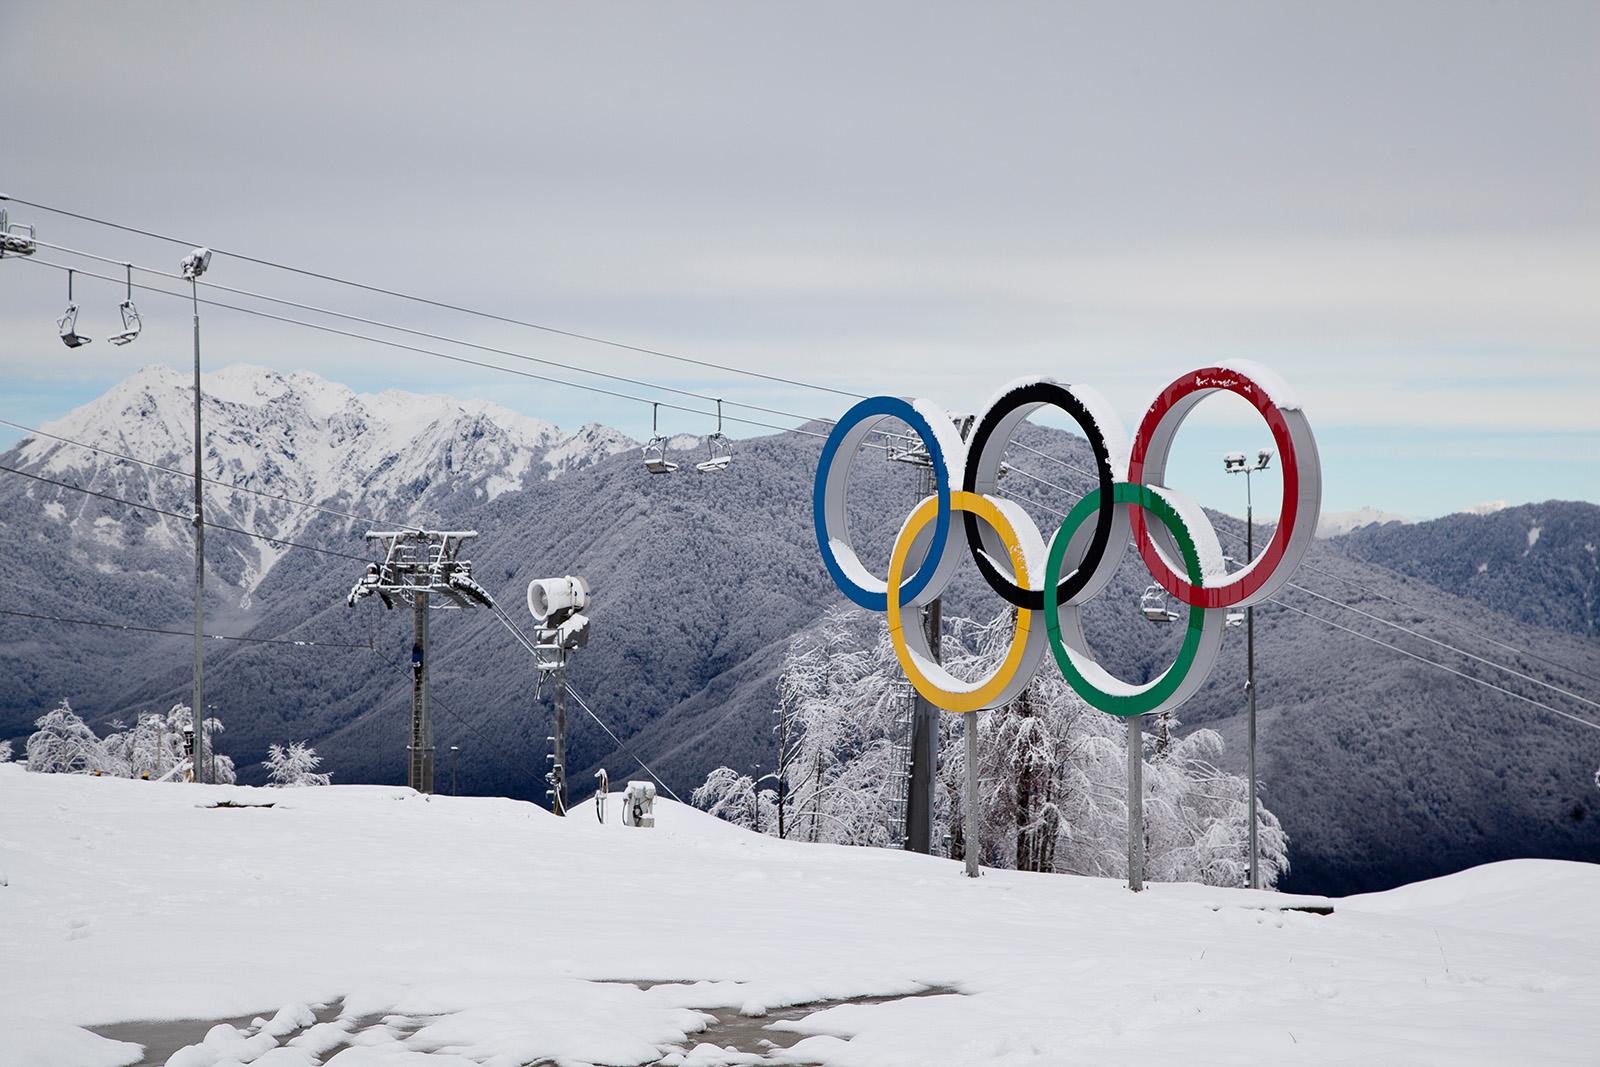 Olympische Ringe vor Bergpanorama mit Skilift